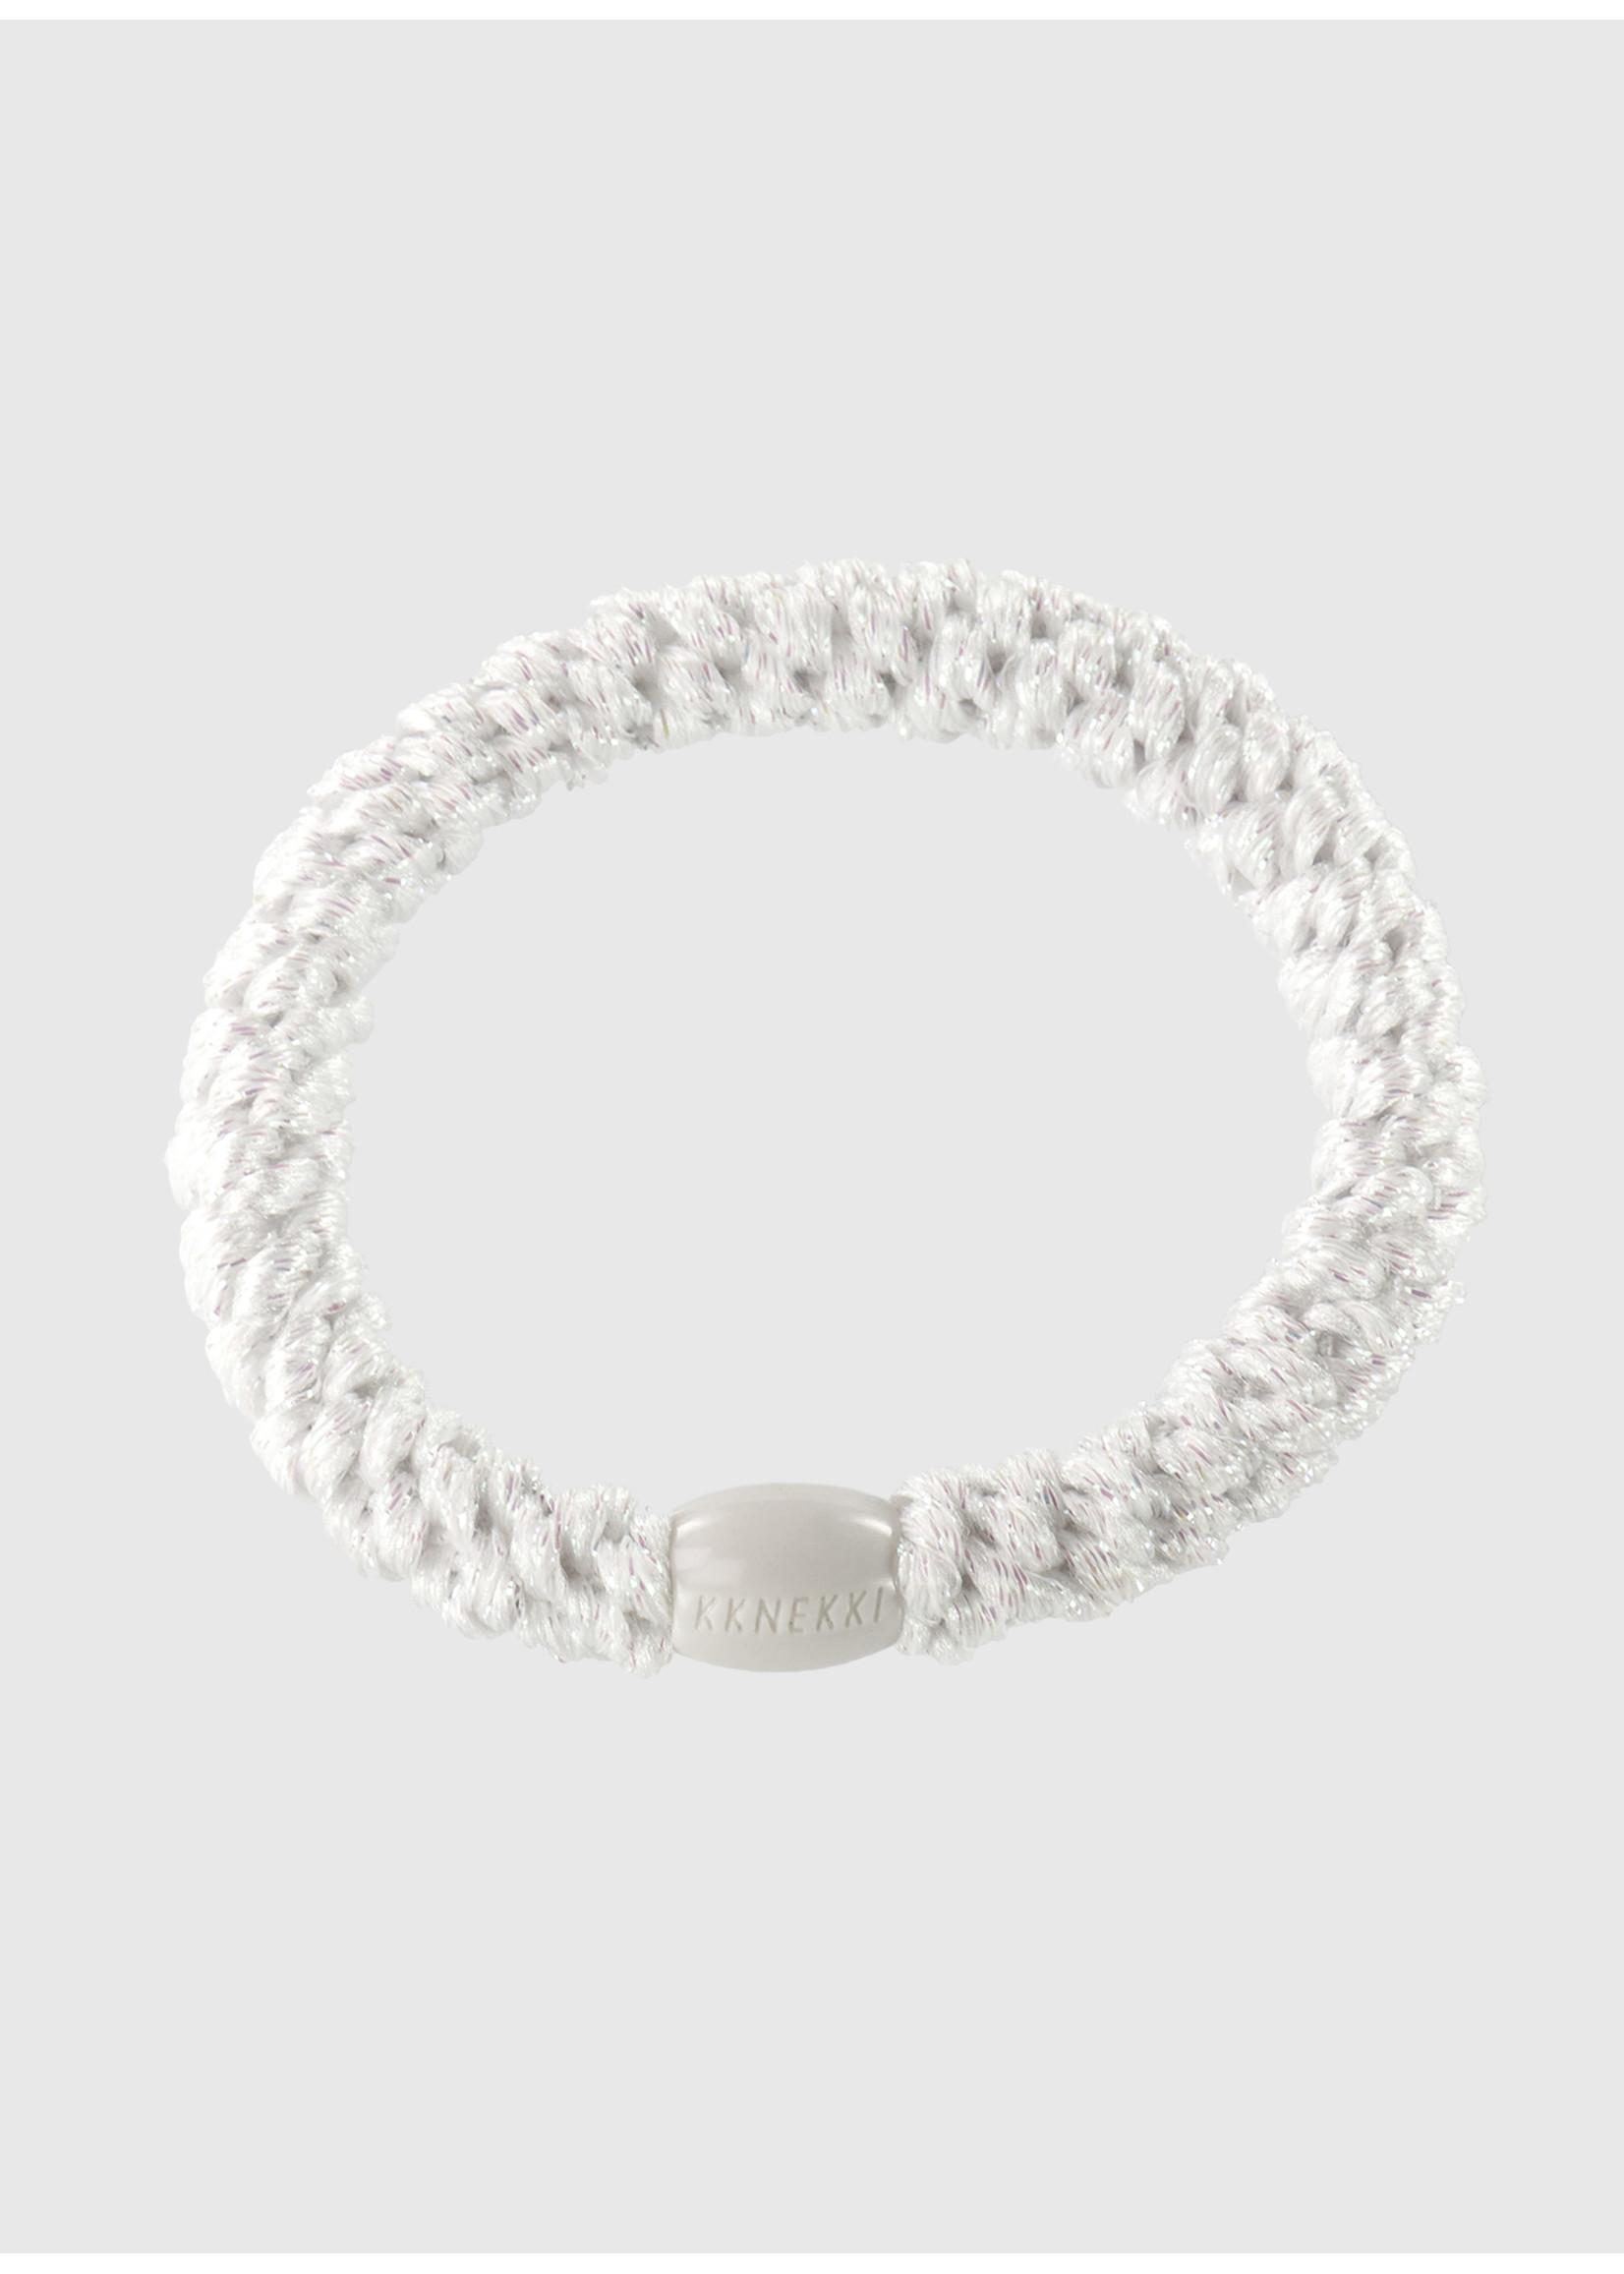 Kknekki by Bon Dep White glitter